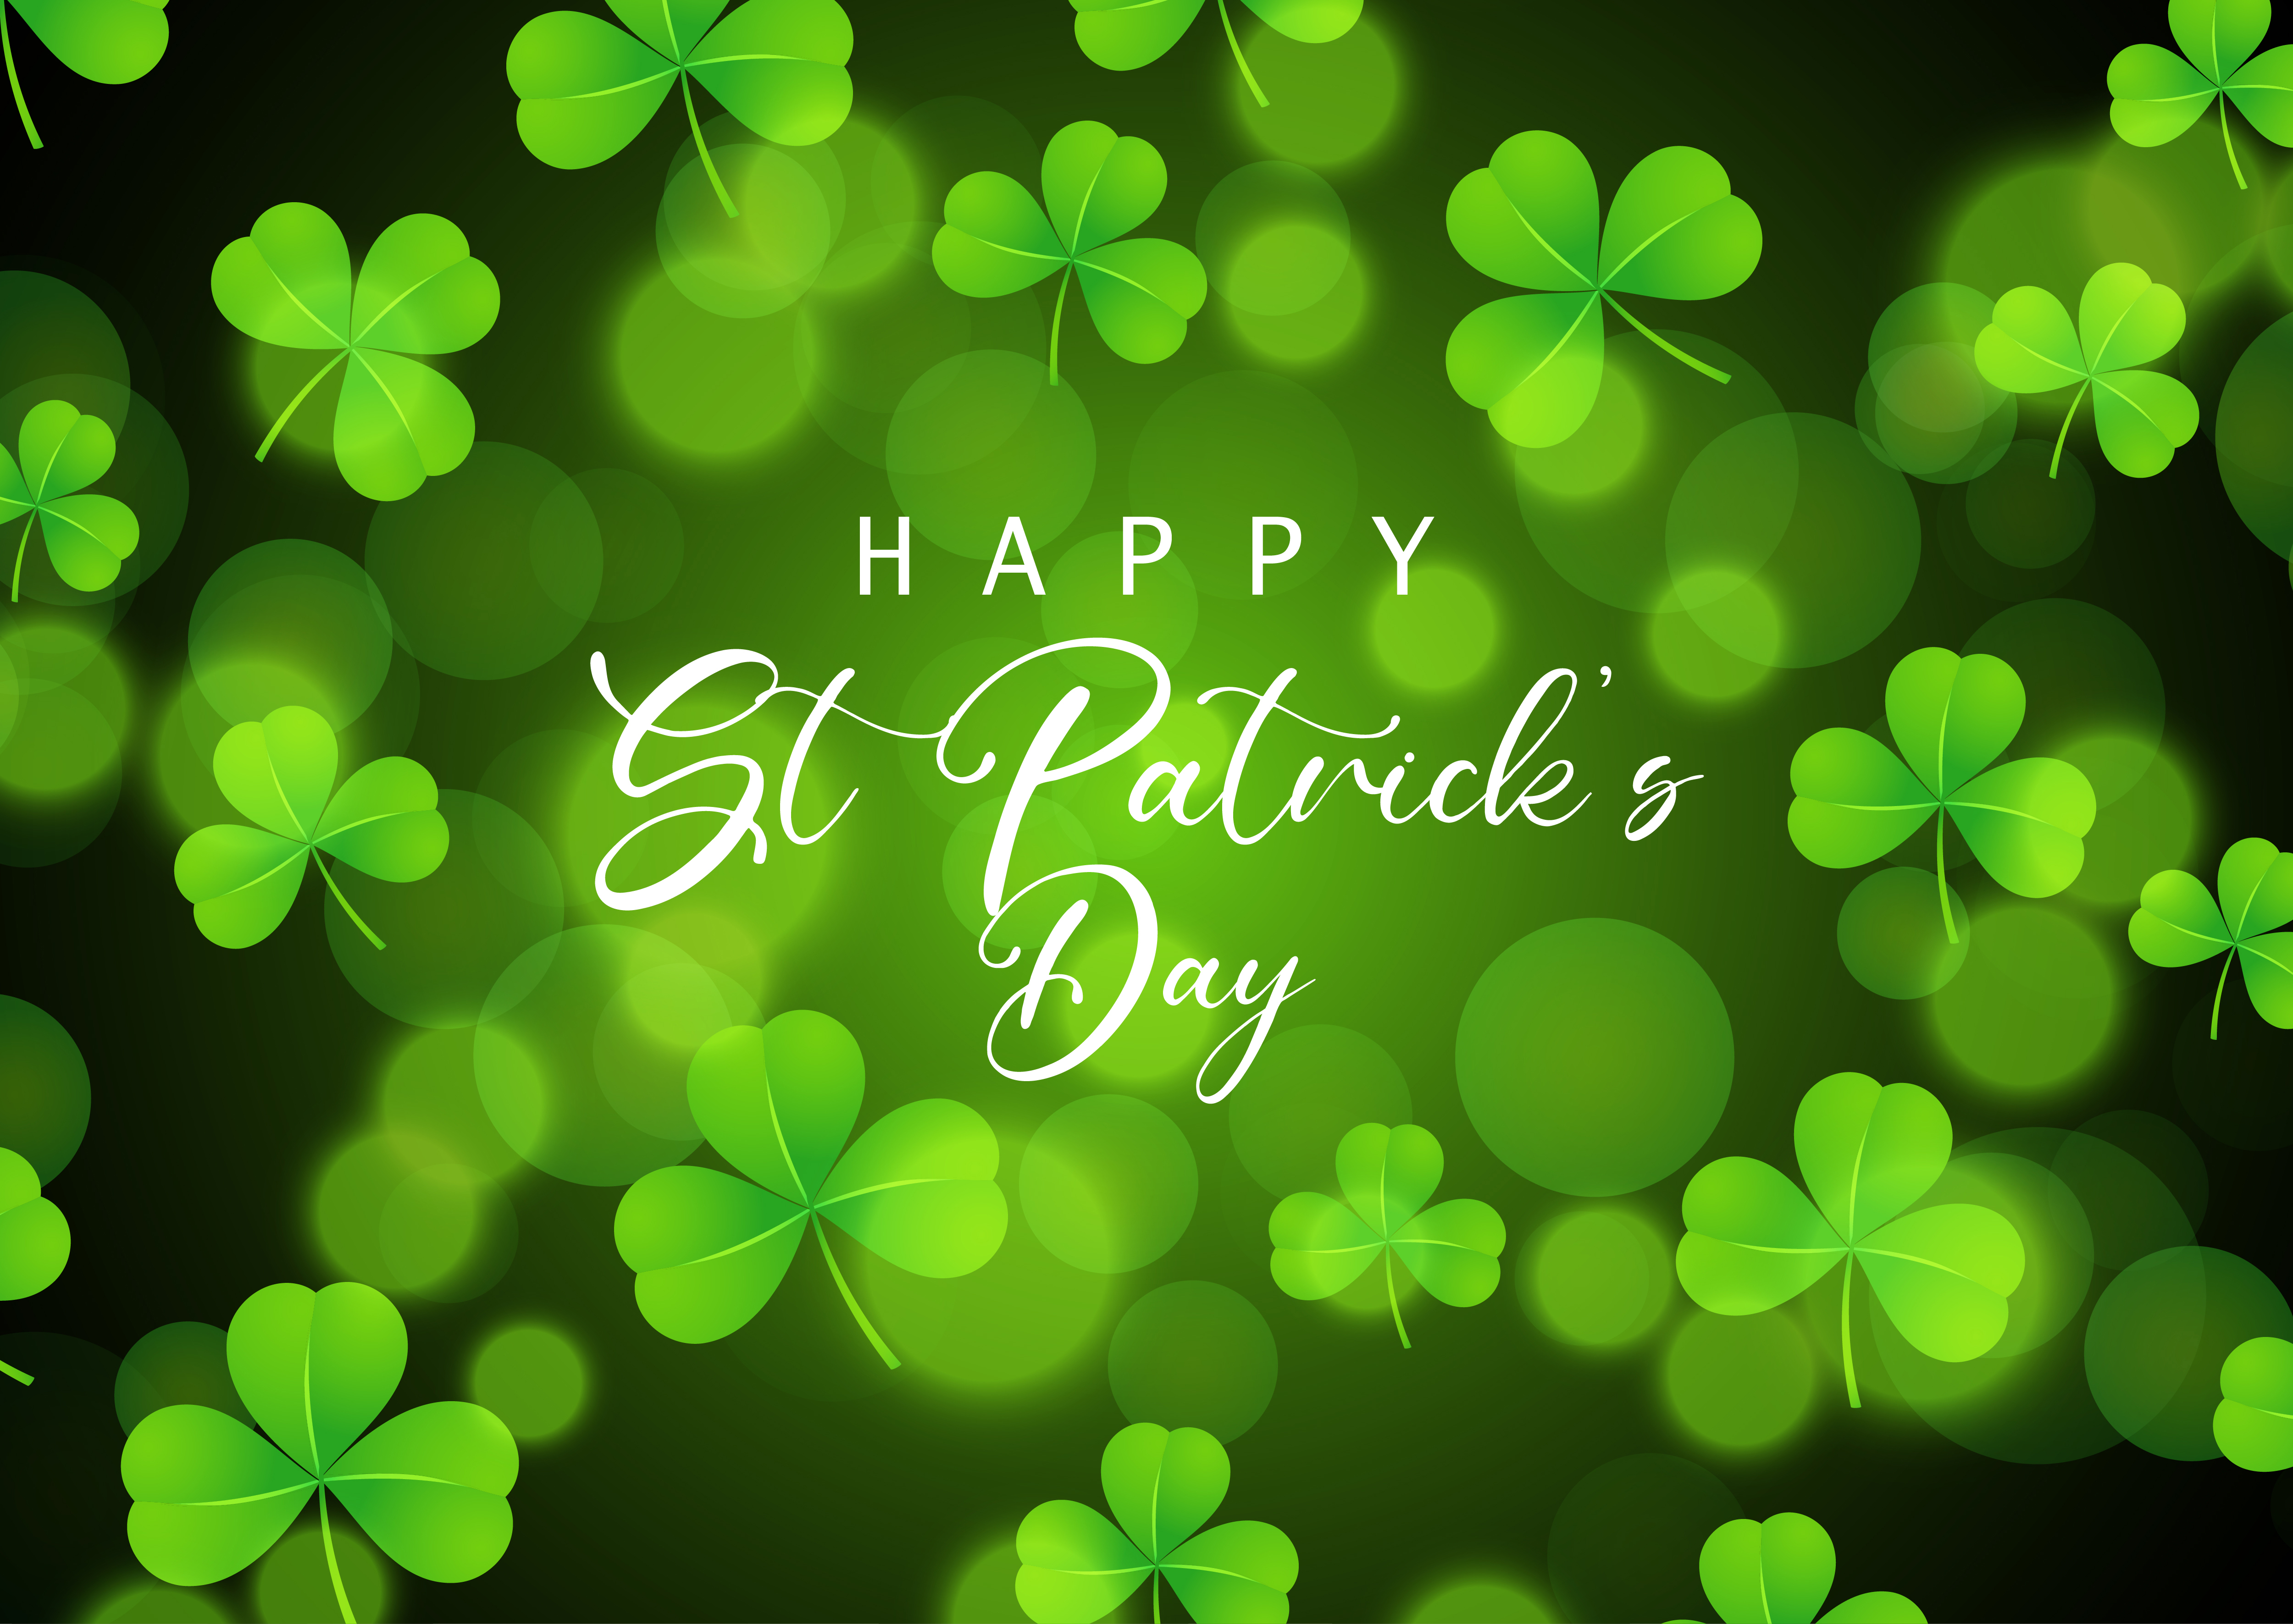 St Patrick's Day background with shamrock on bokeh lights ...